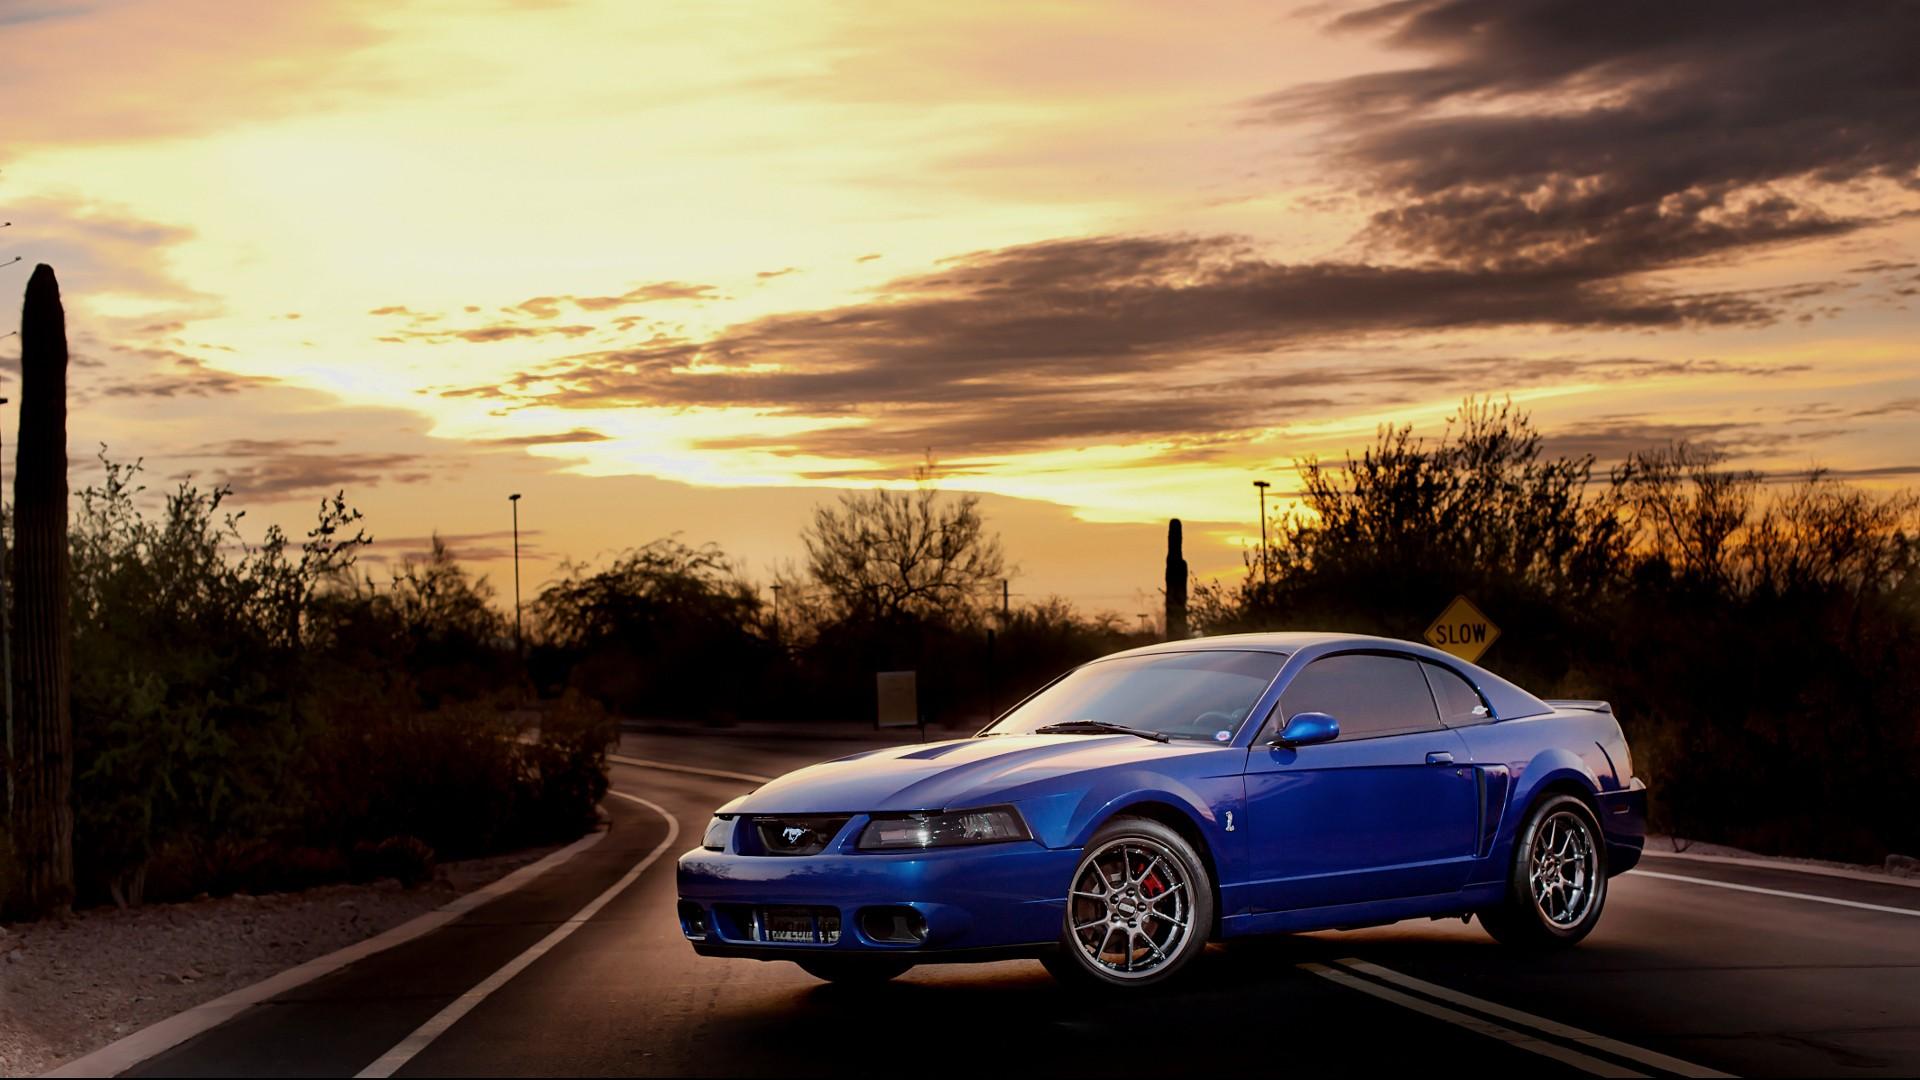 2000 Ford Mustang Gt Wallpapers Mustangspecs Com